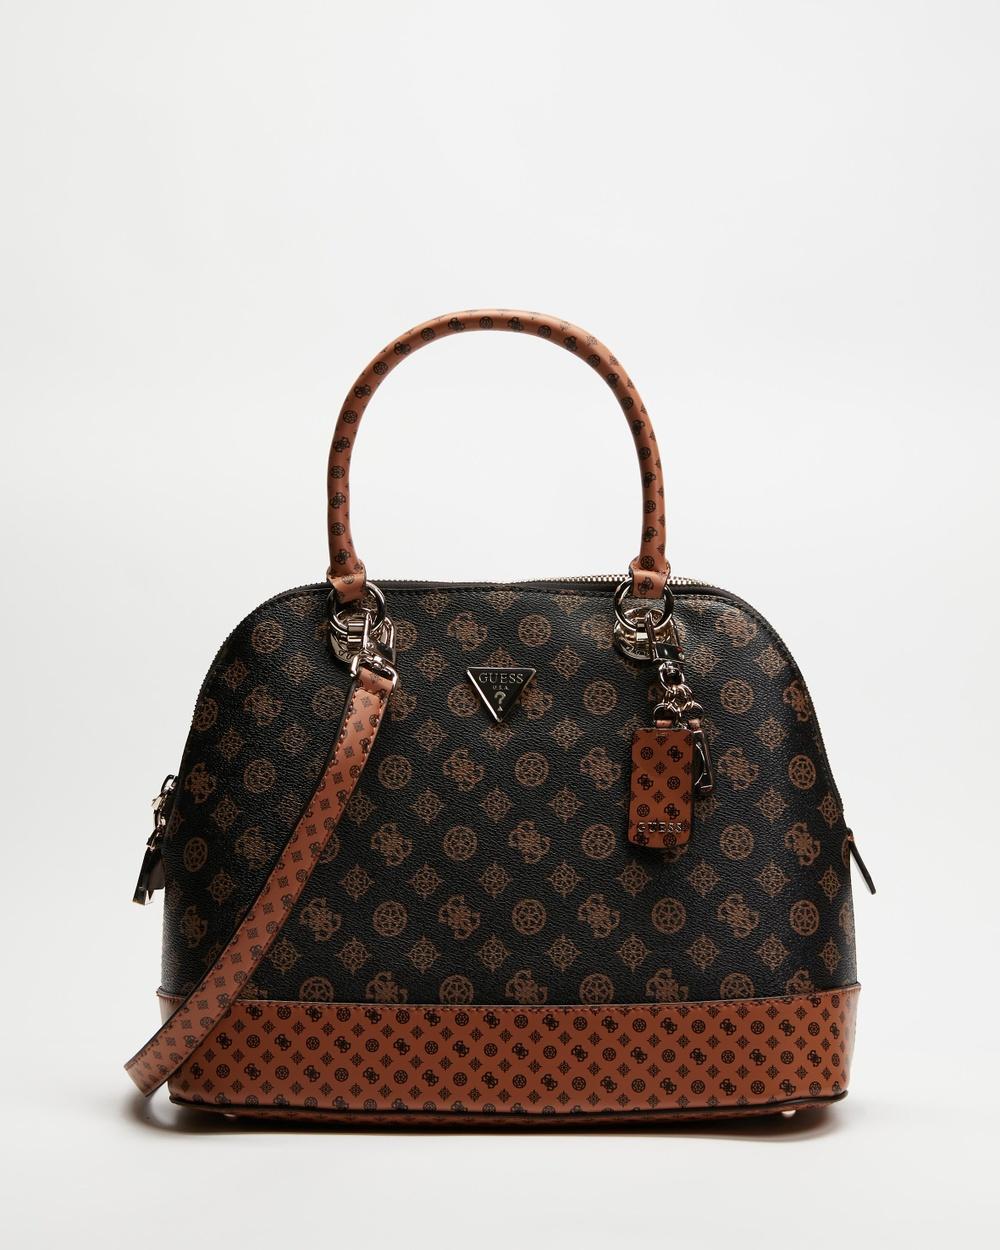 Guess Cessily Dome Satchel Bag Handbags Brown & Mocha